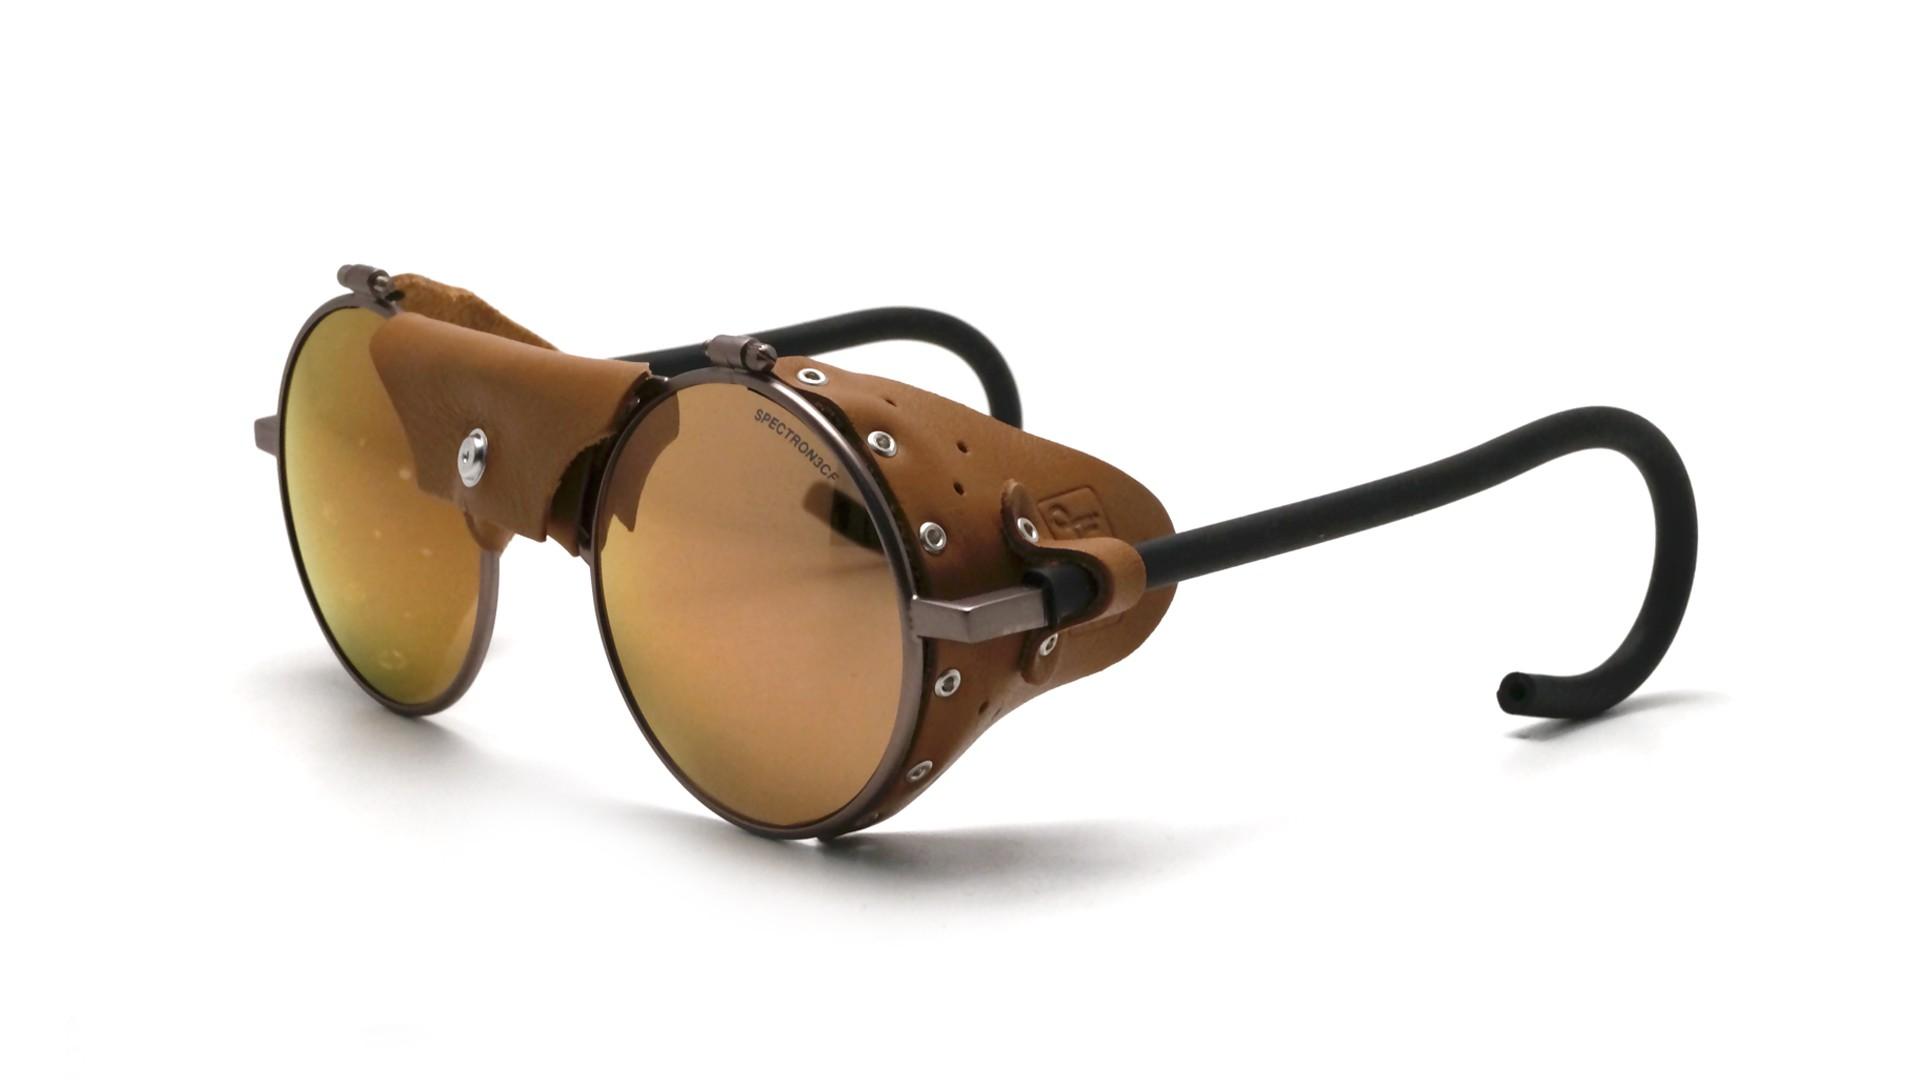 fd03d01922 Sunglasses Julbo Vermont Classic Laiton Brown J010 11 50 Brown leather  shell Brown Lenses 51-23 Medium Flash